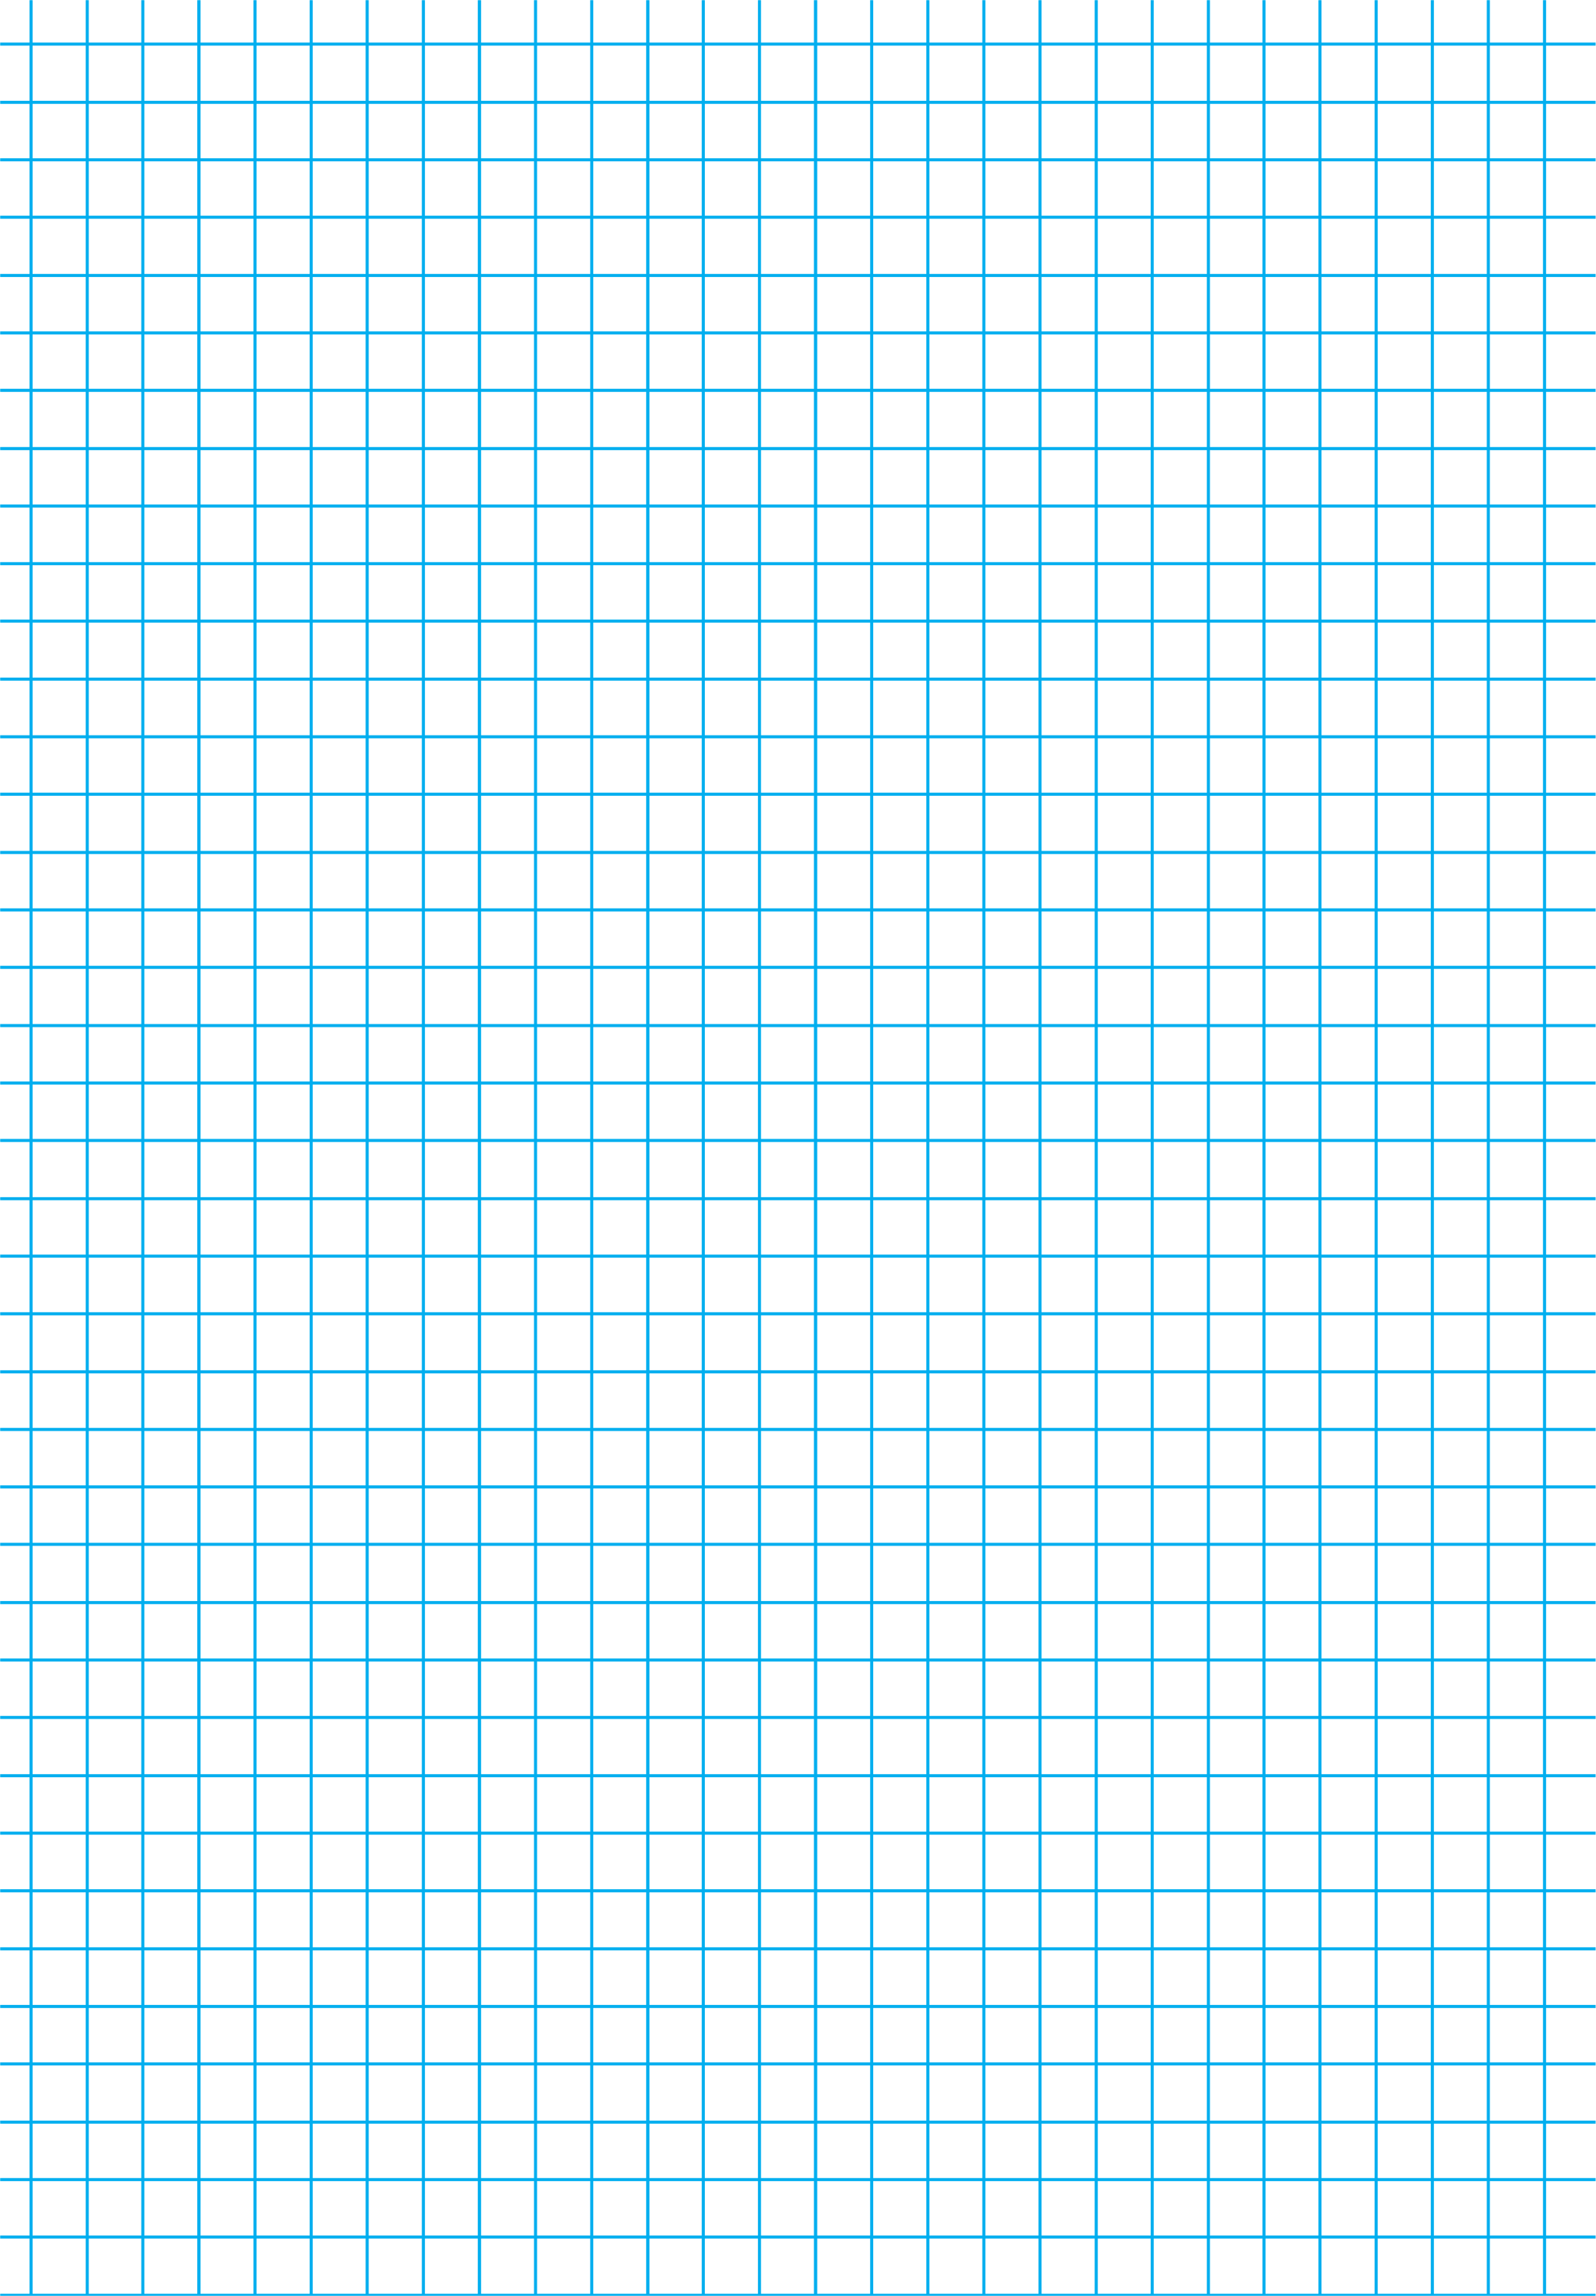 картинки на прозрачном фоне лист в клеточку